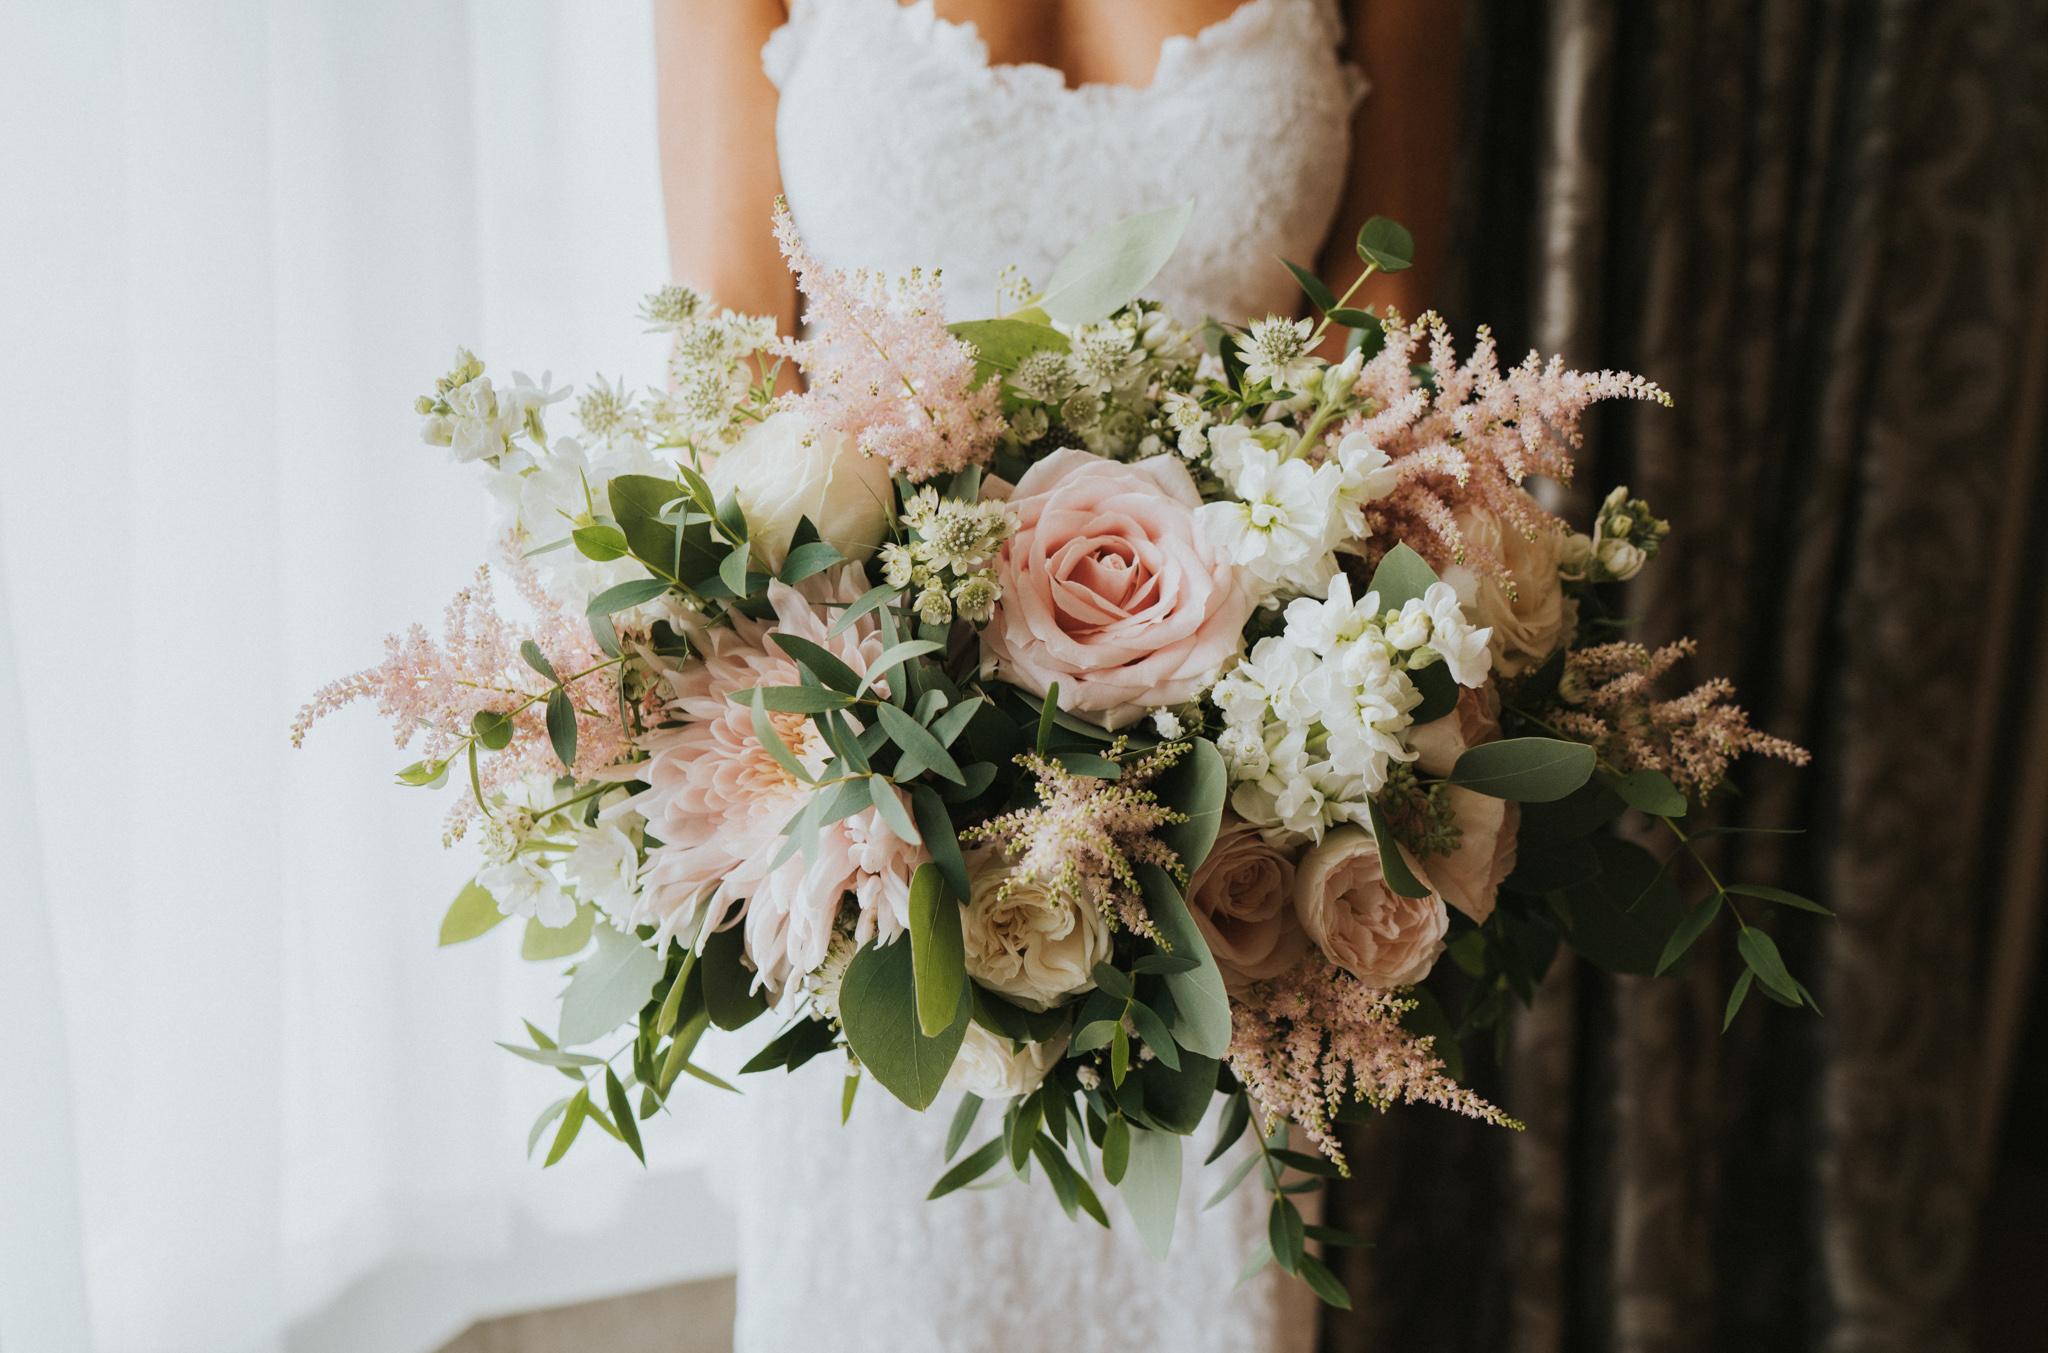 Sarah-Alex-Wivenhoe-House-St-Osyth-Church-Intimate-Wedding-Grace-Elizabeth-Colchester-Essex-Alternative-Wedding-Lifestyle-Photographer (5 of 11).jpg